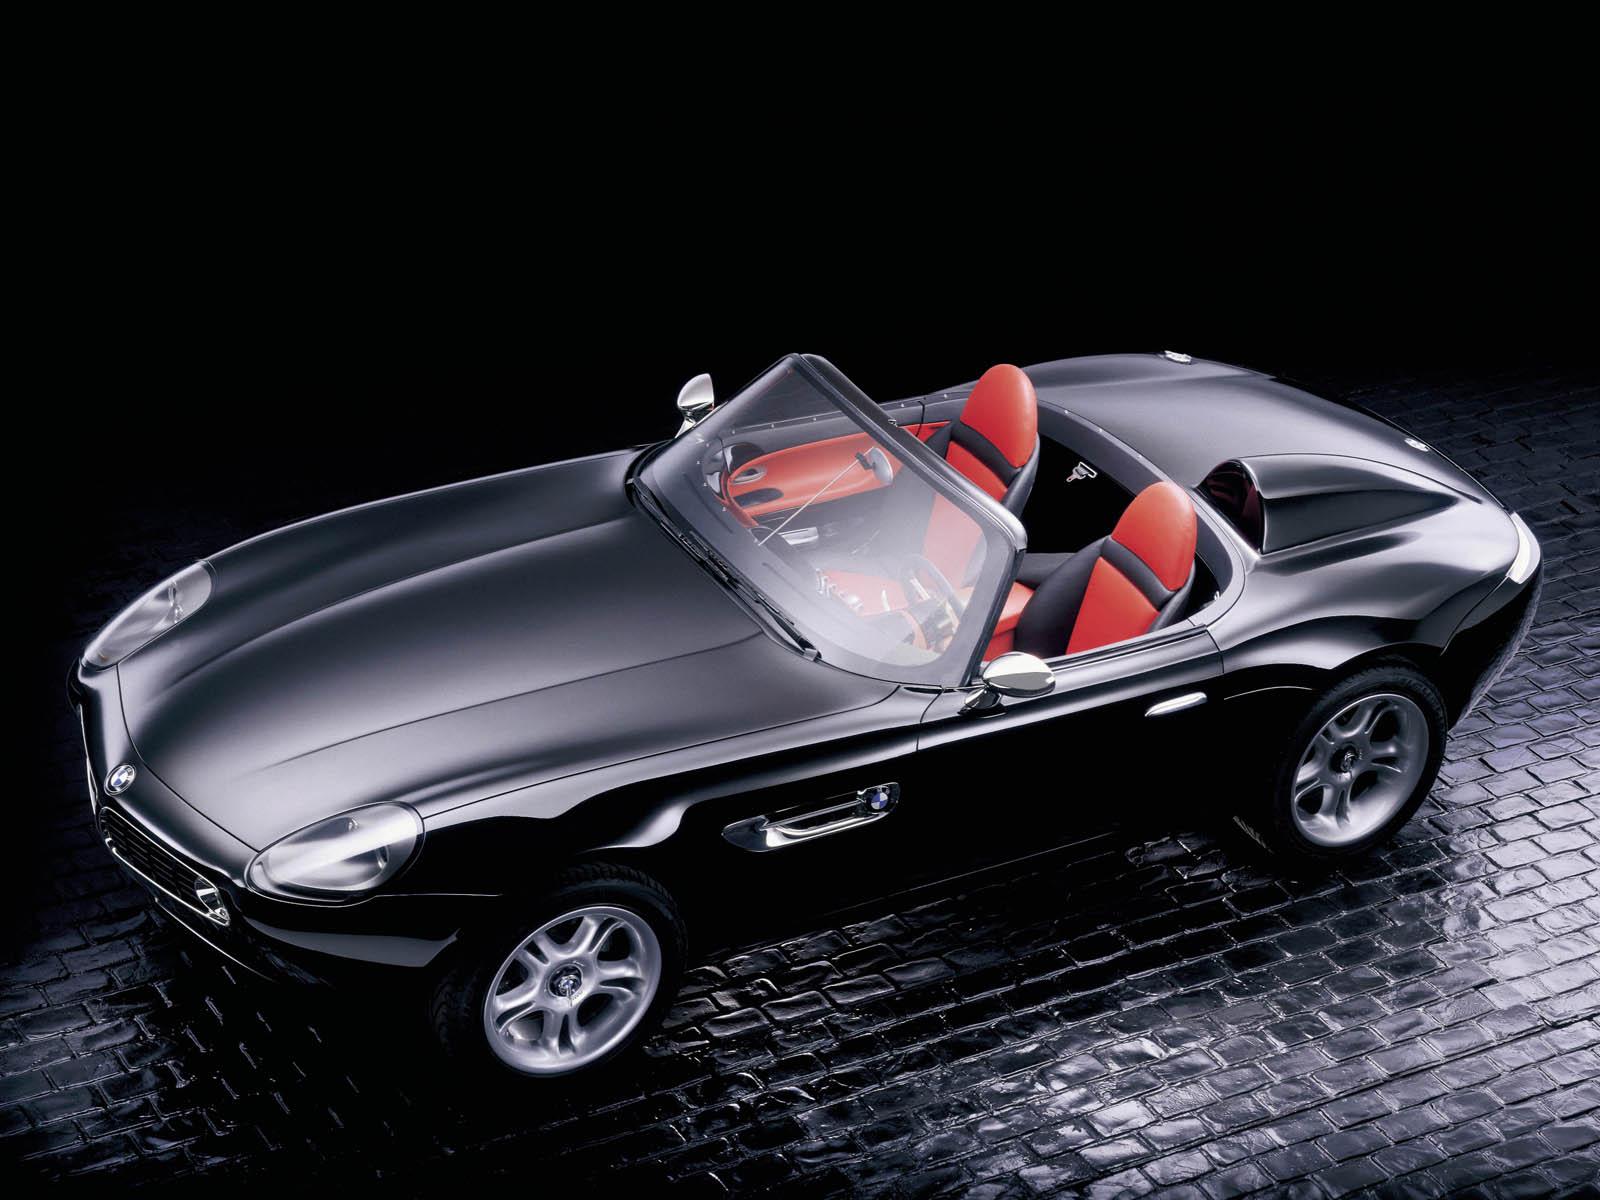 Bmw Z8 Roadster E52 Specs 2000 2001 2002 2003